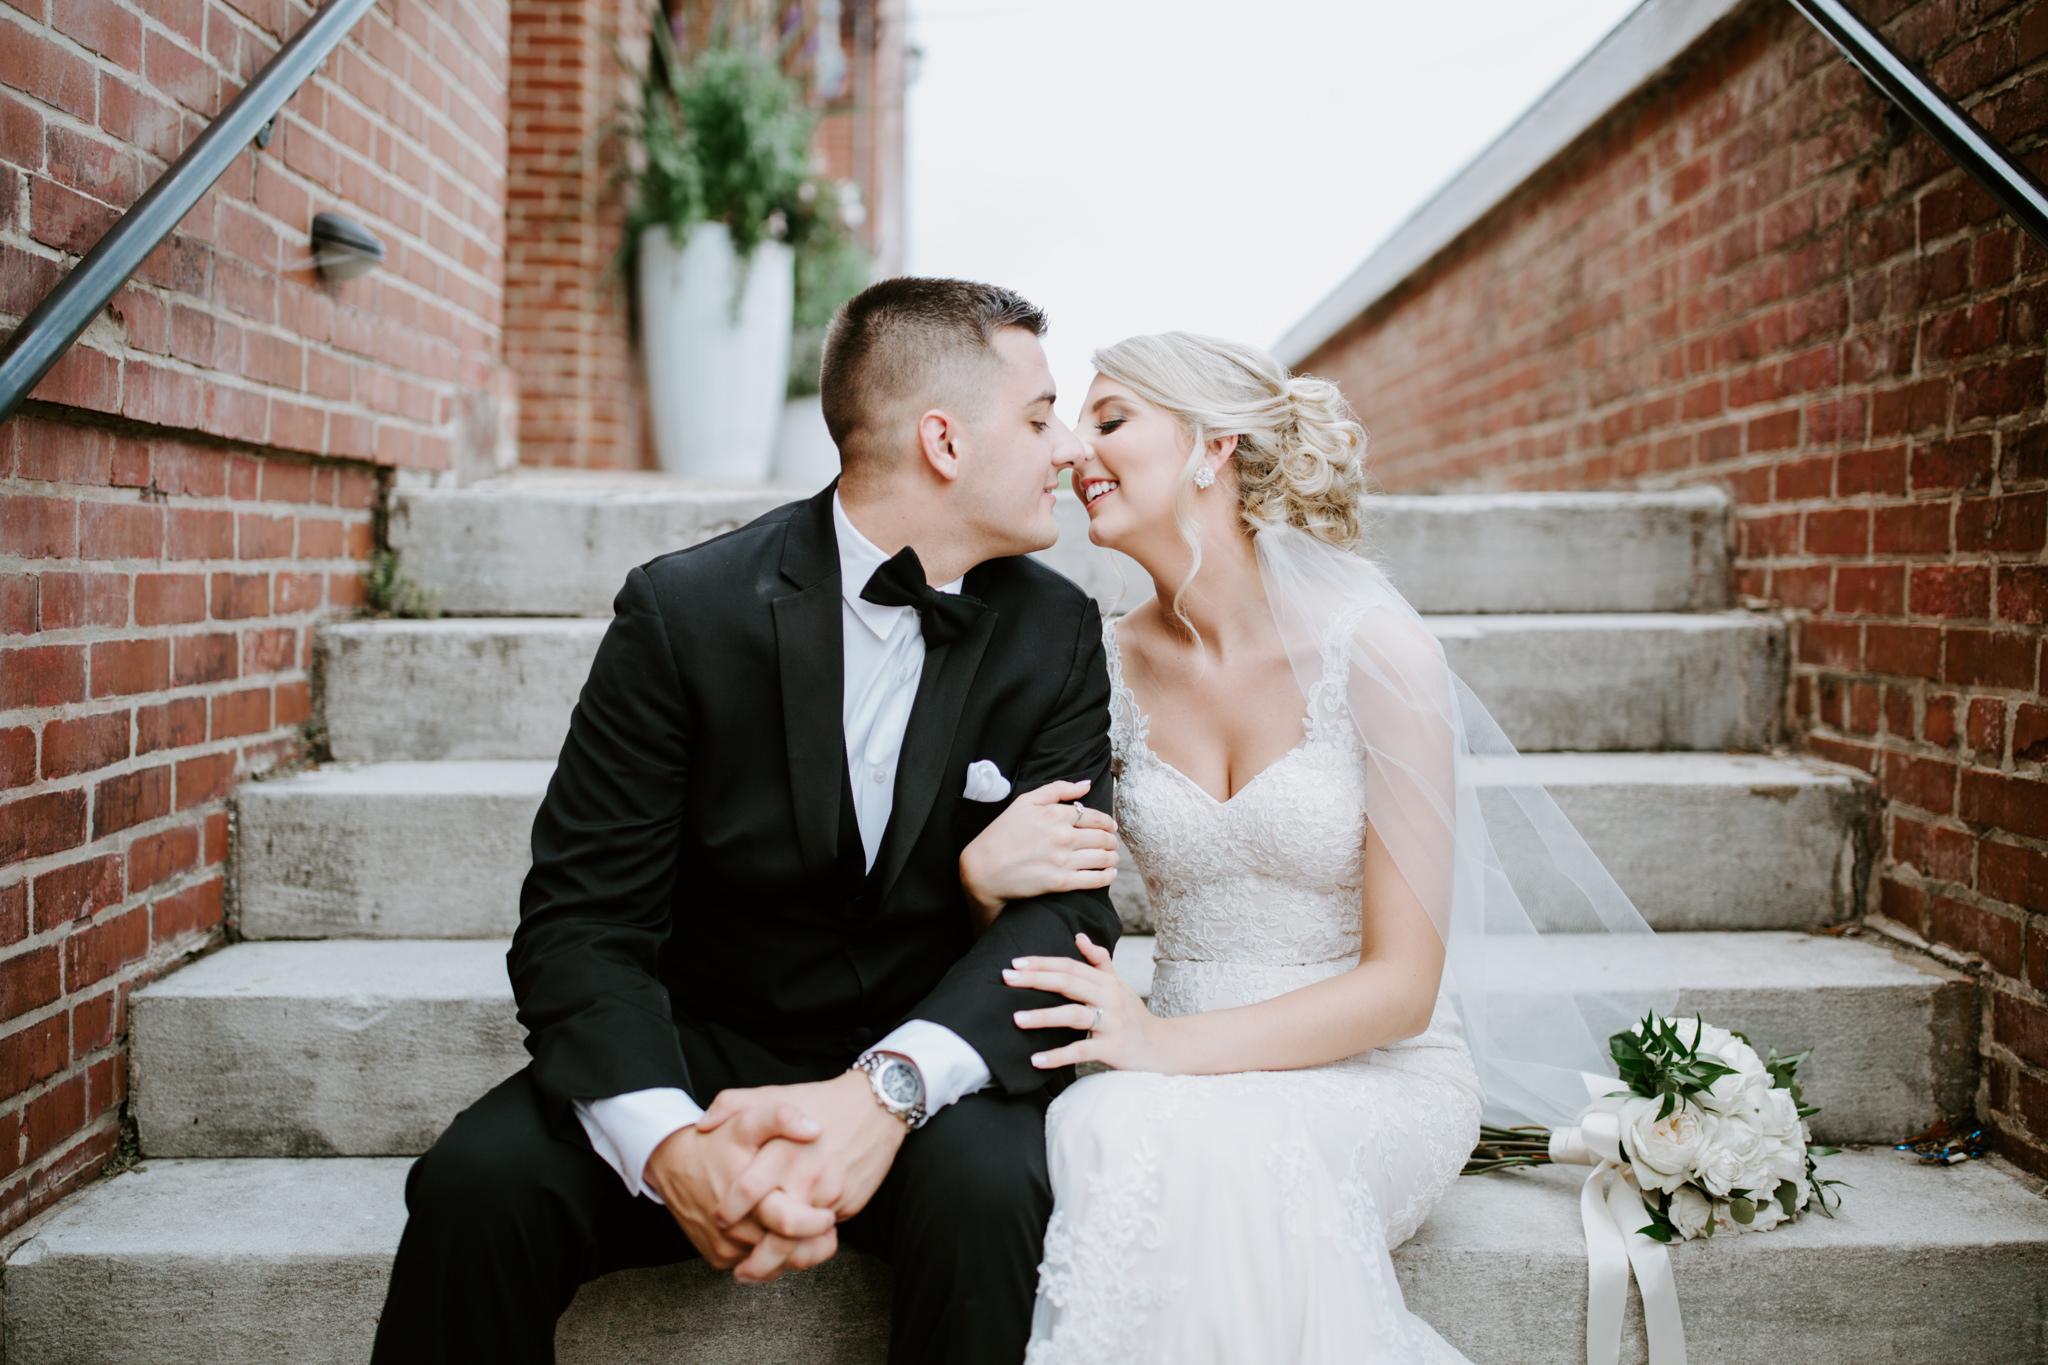 Kayley + Robert + Chattanooga + Nashville + Tennessee + Wedding-41.jpg